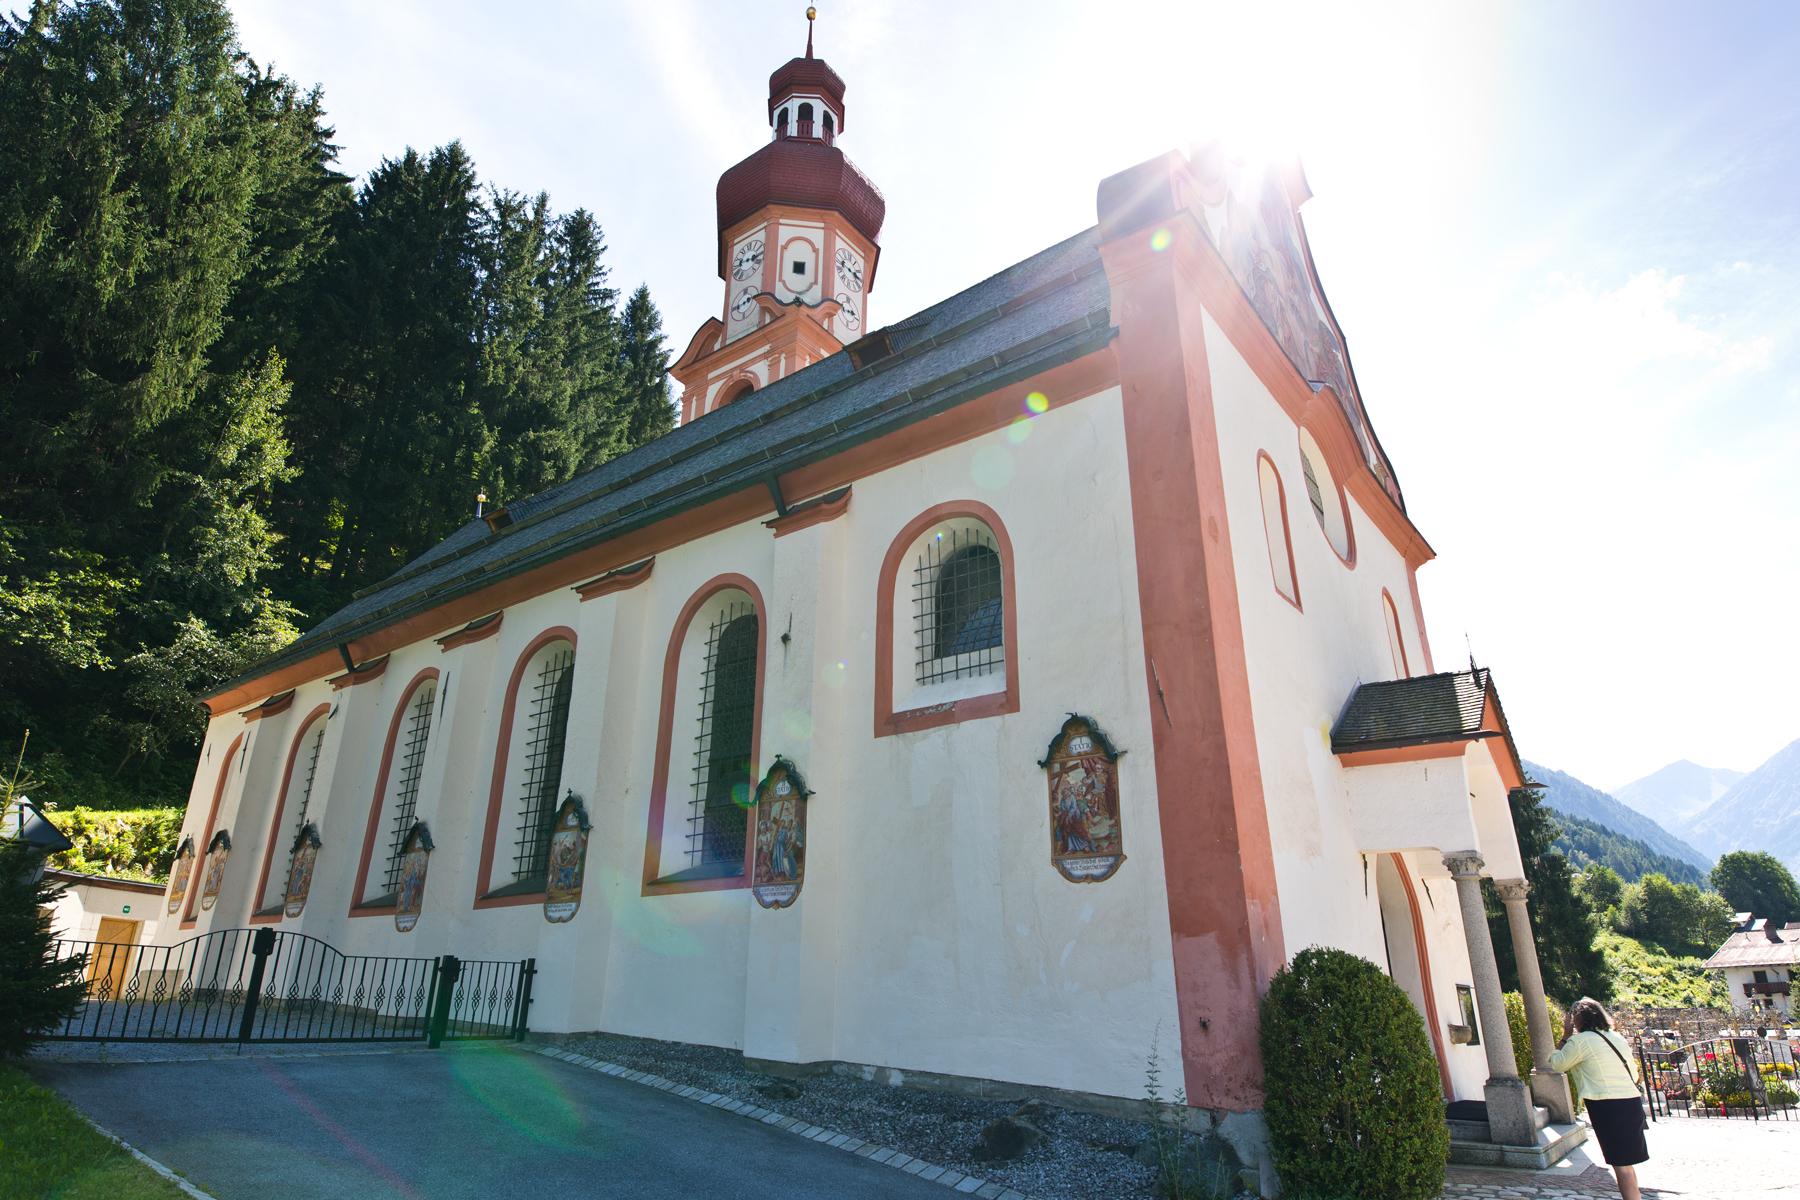 Kirche St. Martin - Gries im Sellrain, Tirol